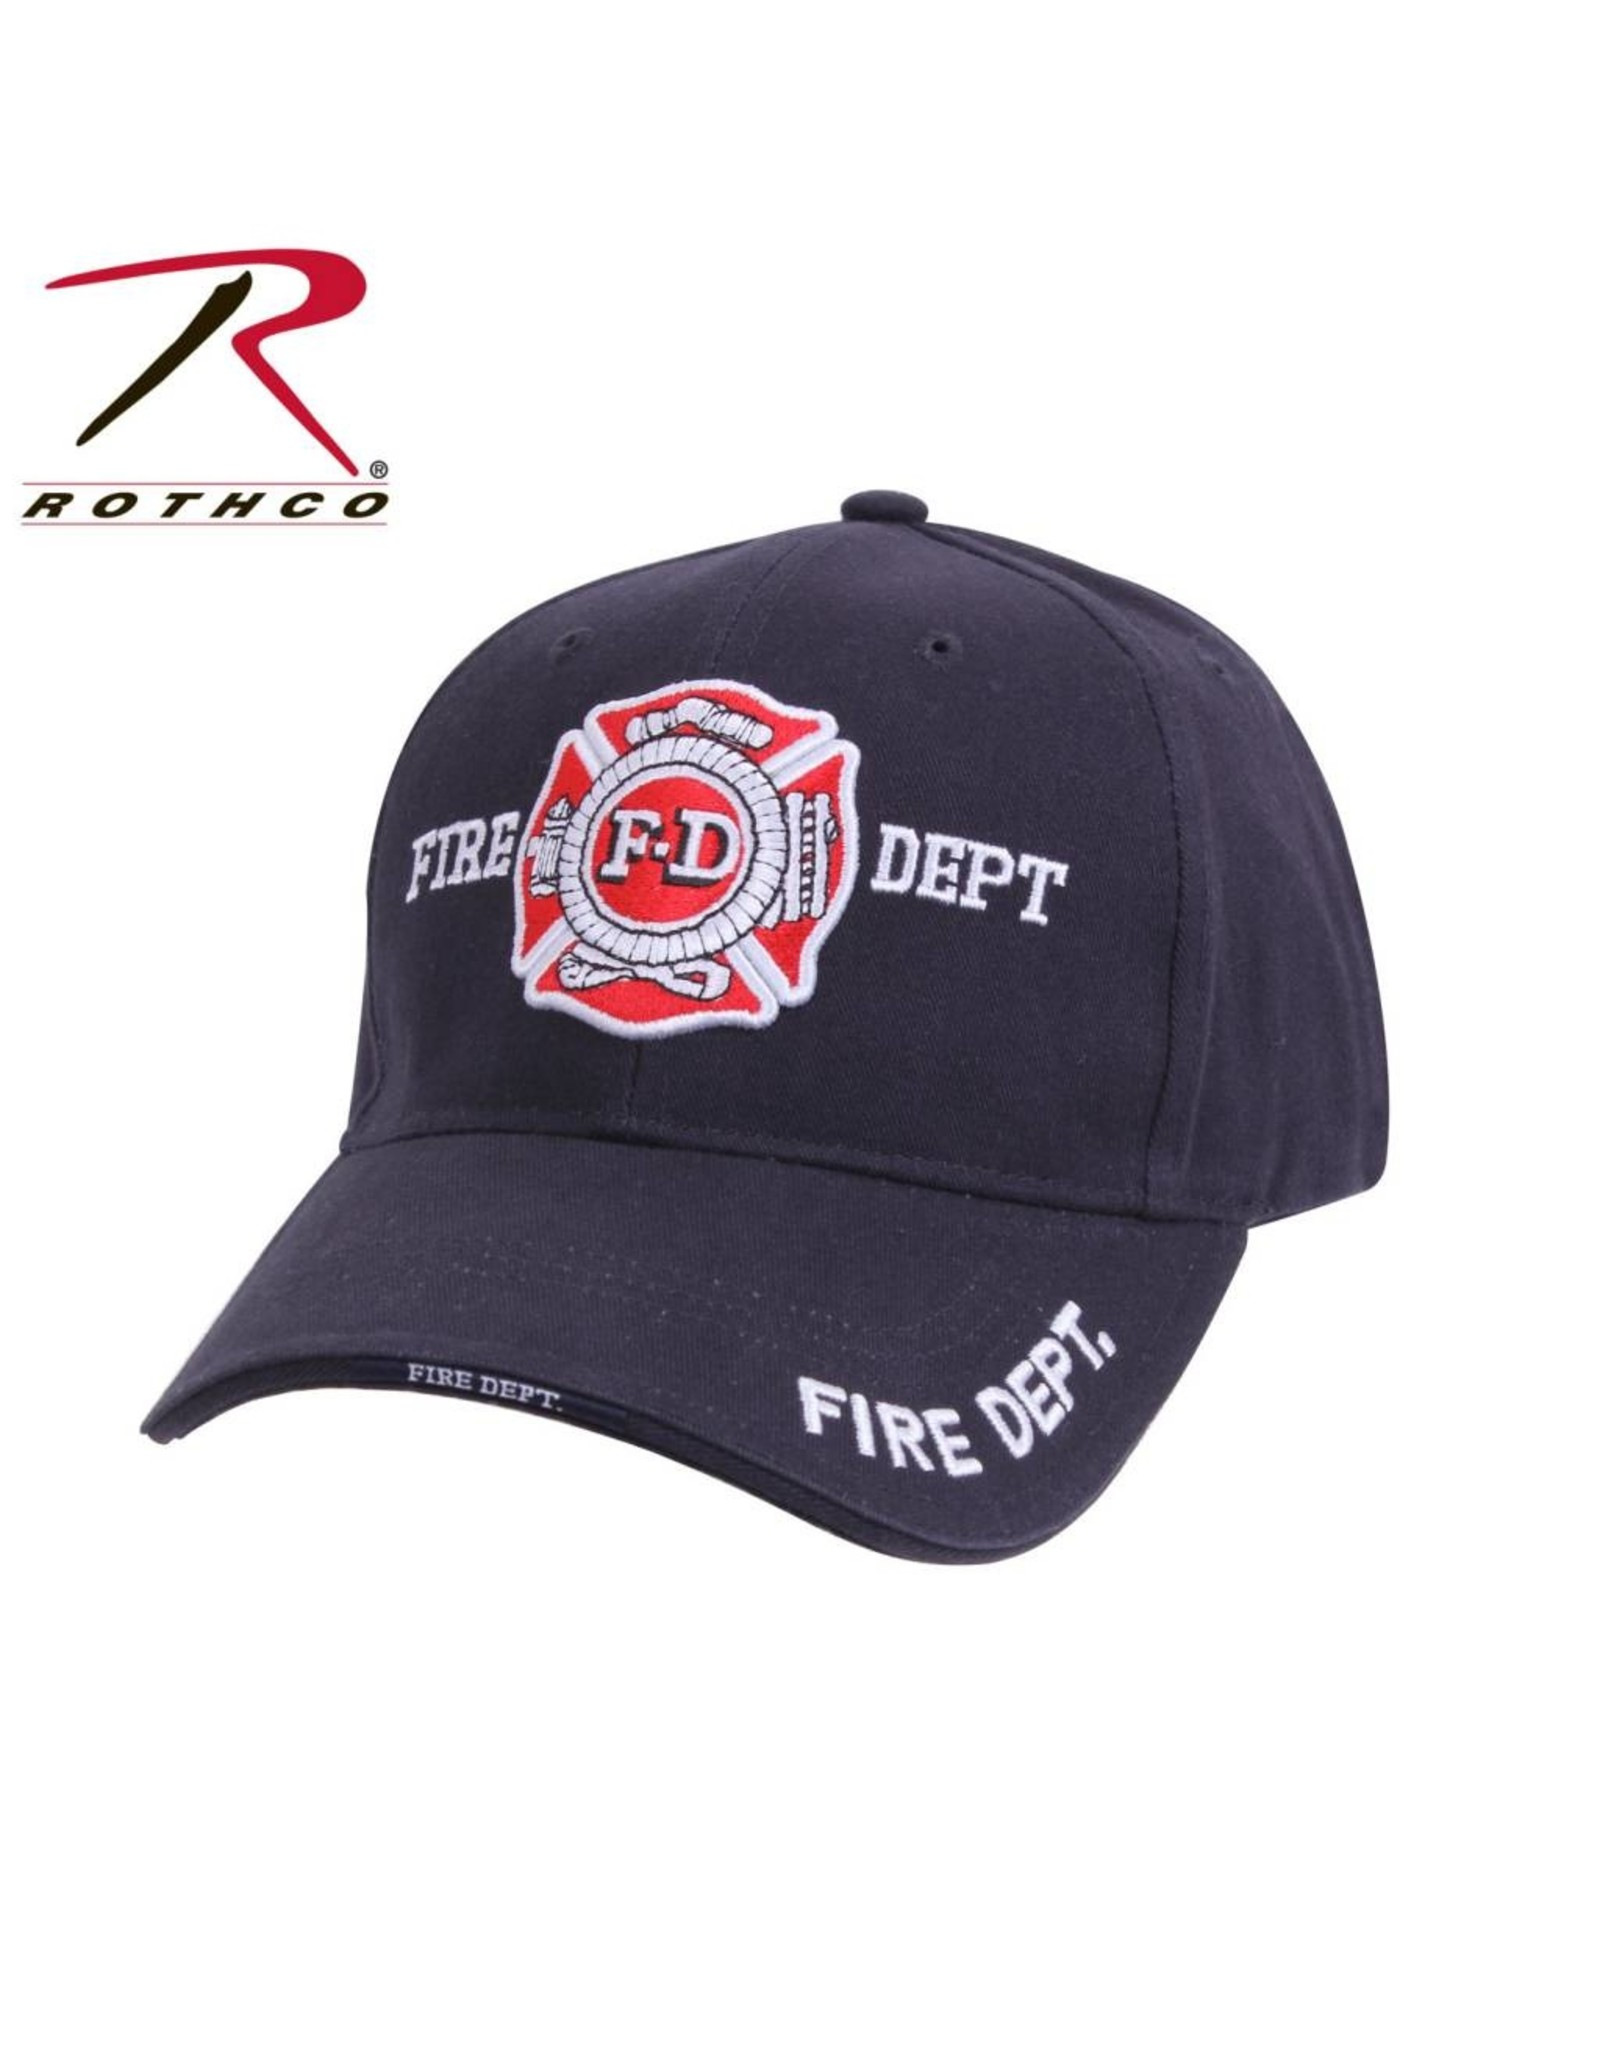 ROTHCO FIRE DEPT BASEBALL CAP